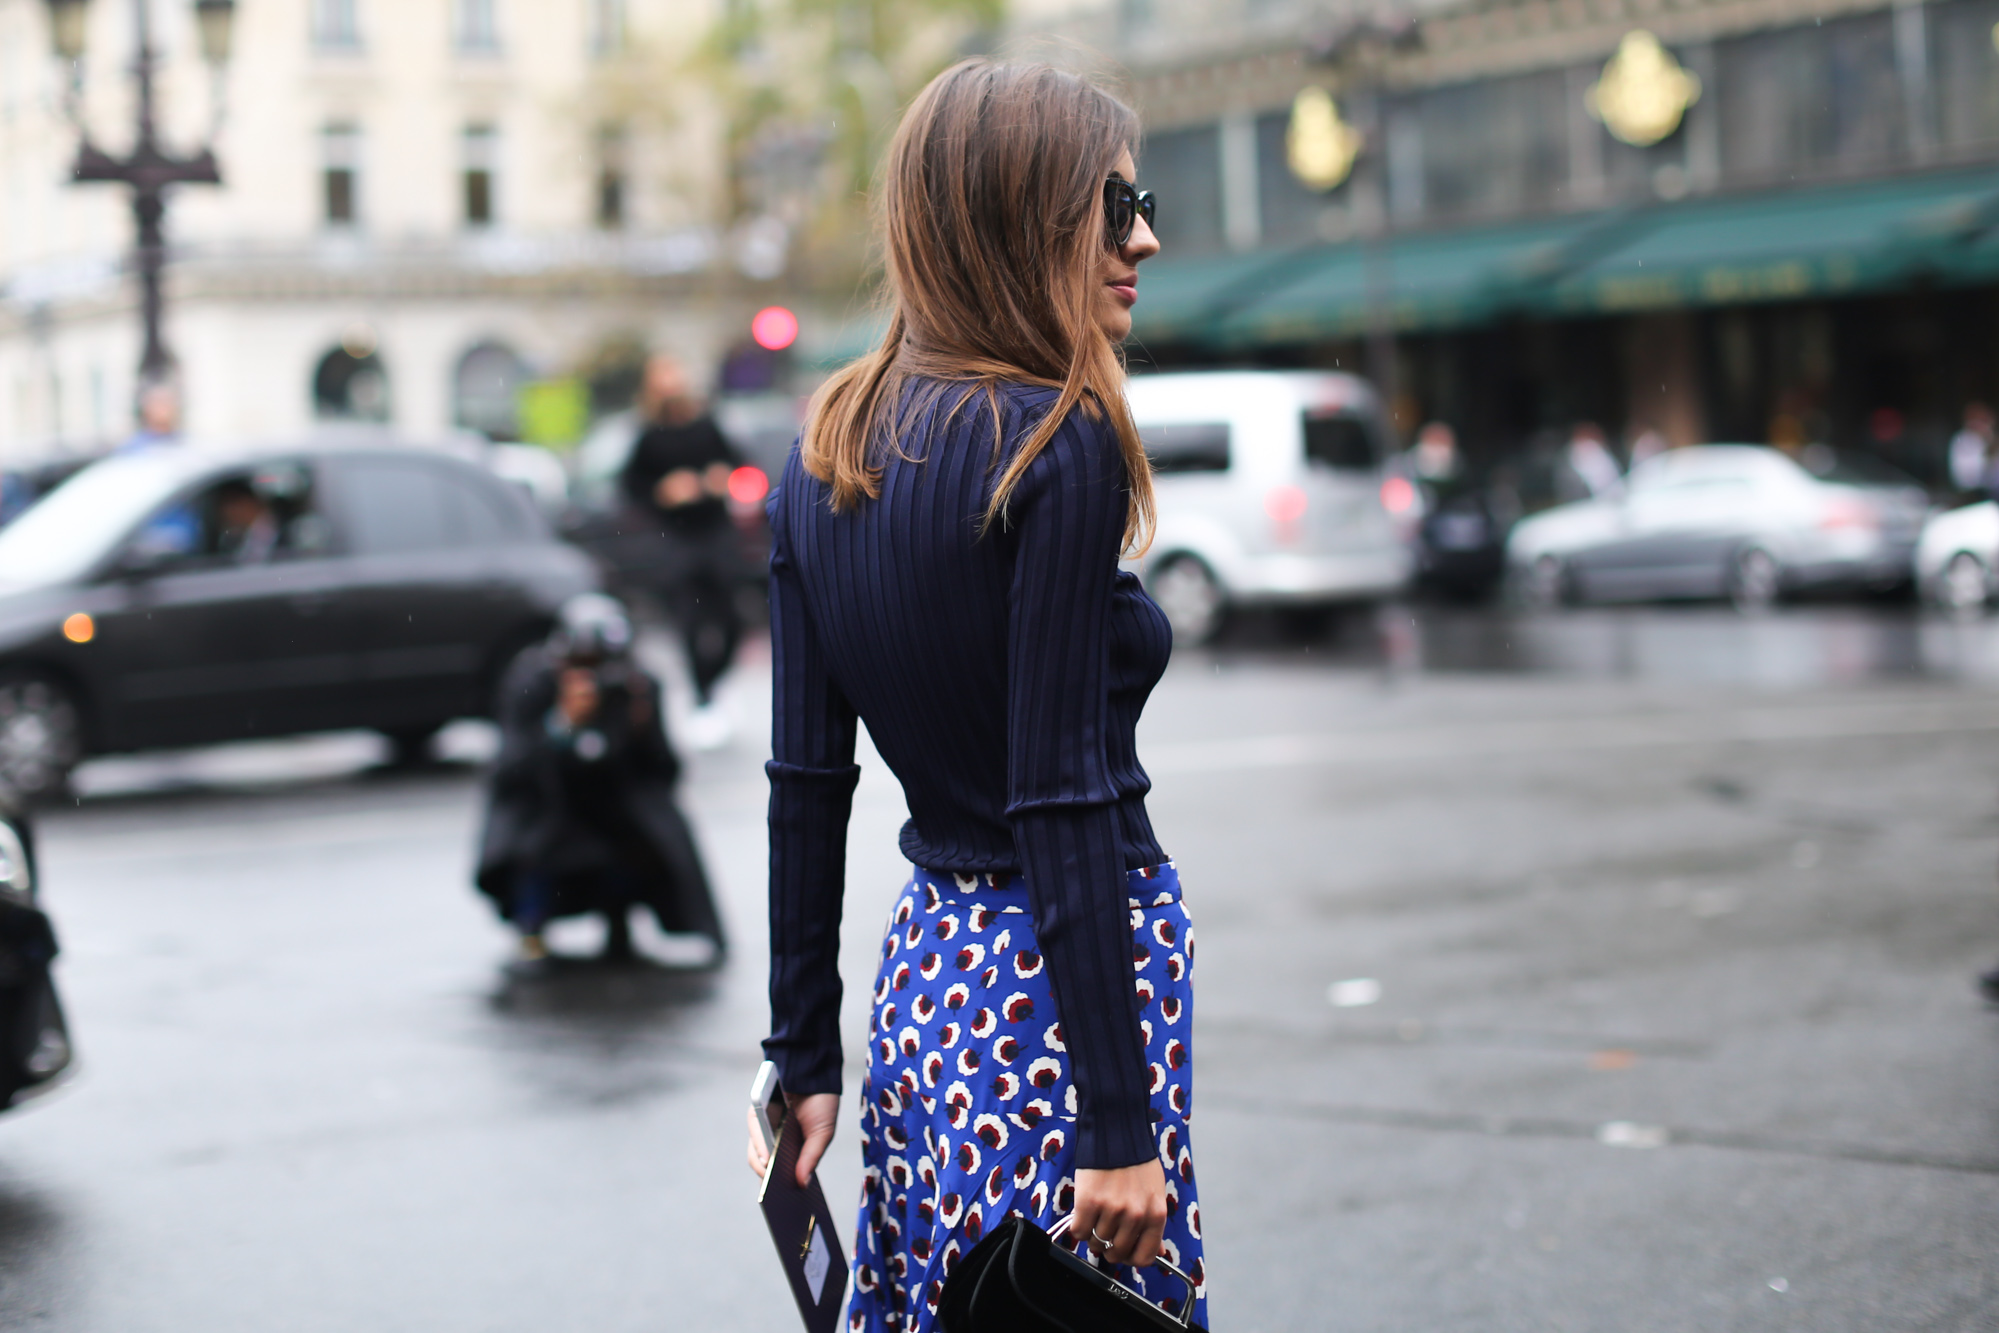 Clochet-streetstyle-paris-fashion-week-patricia-manfield-5